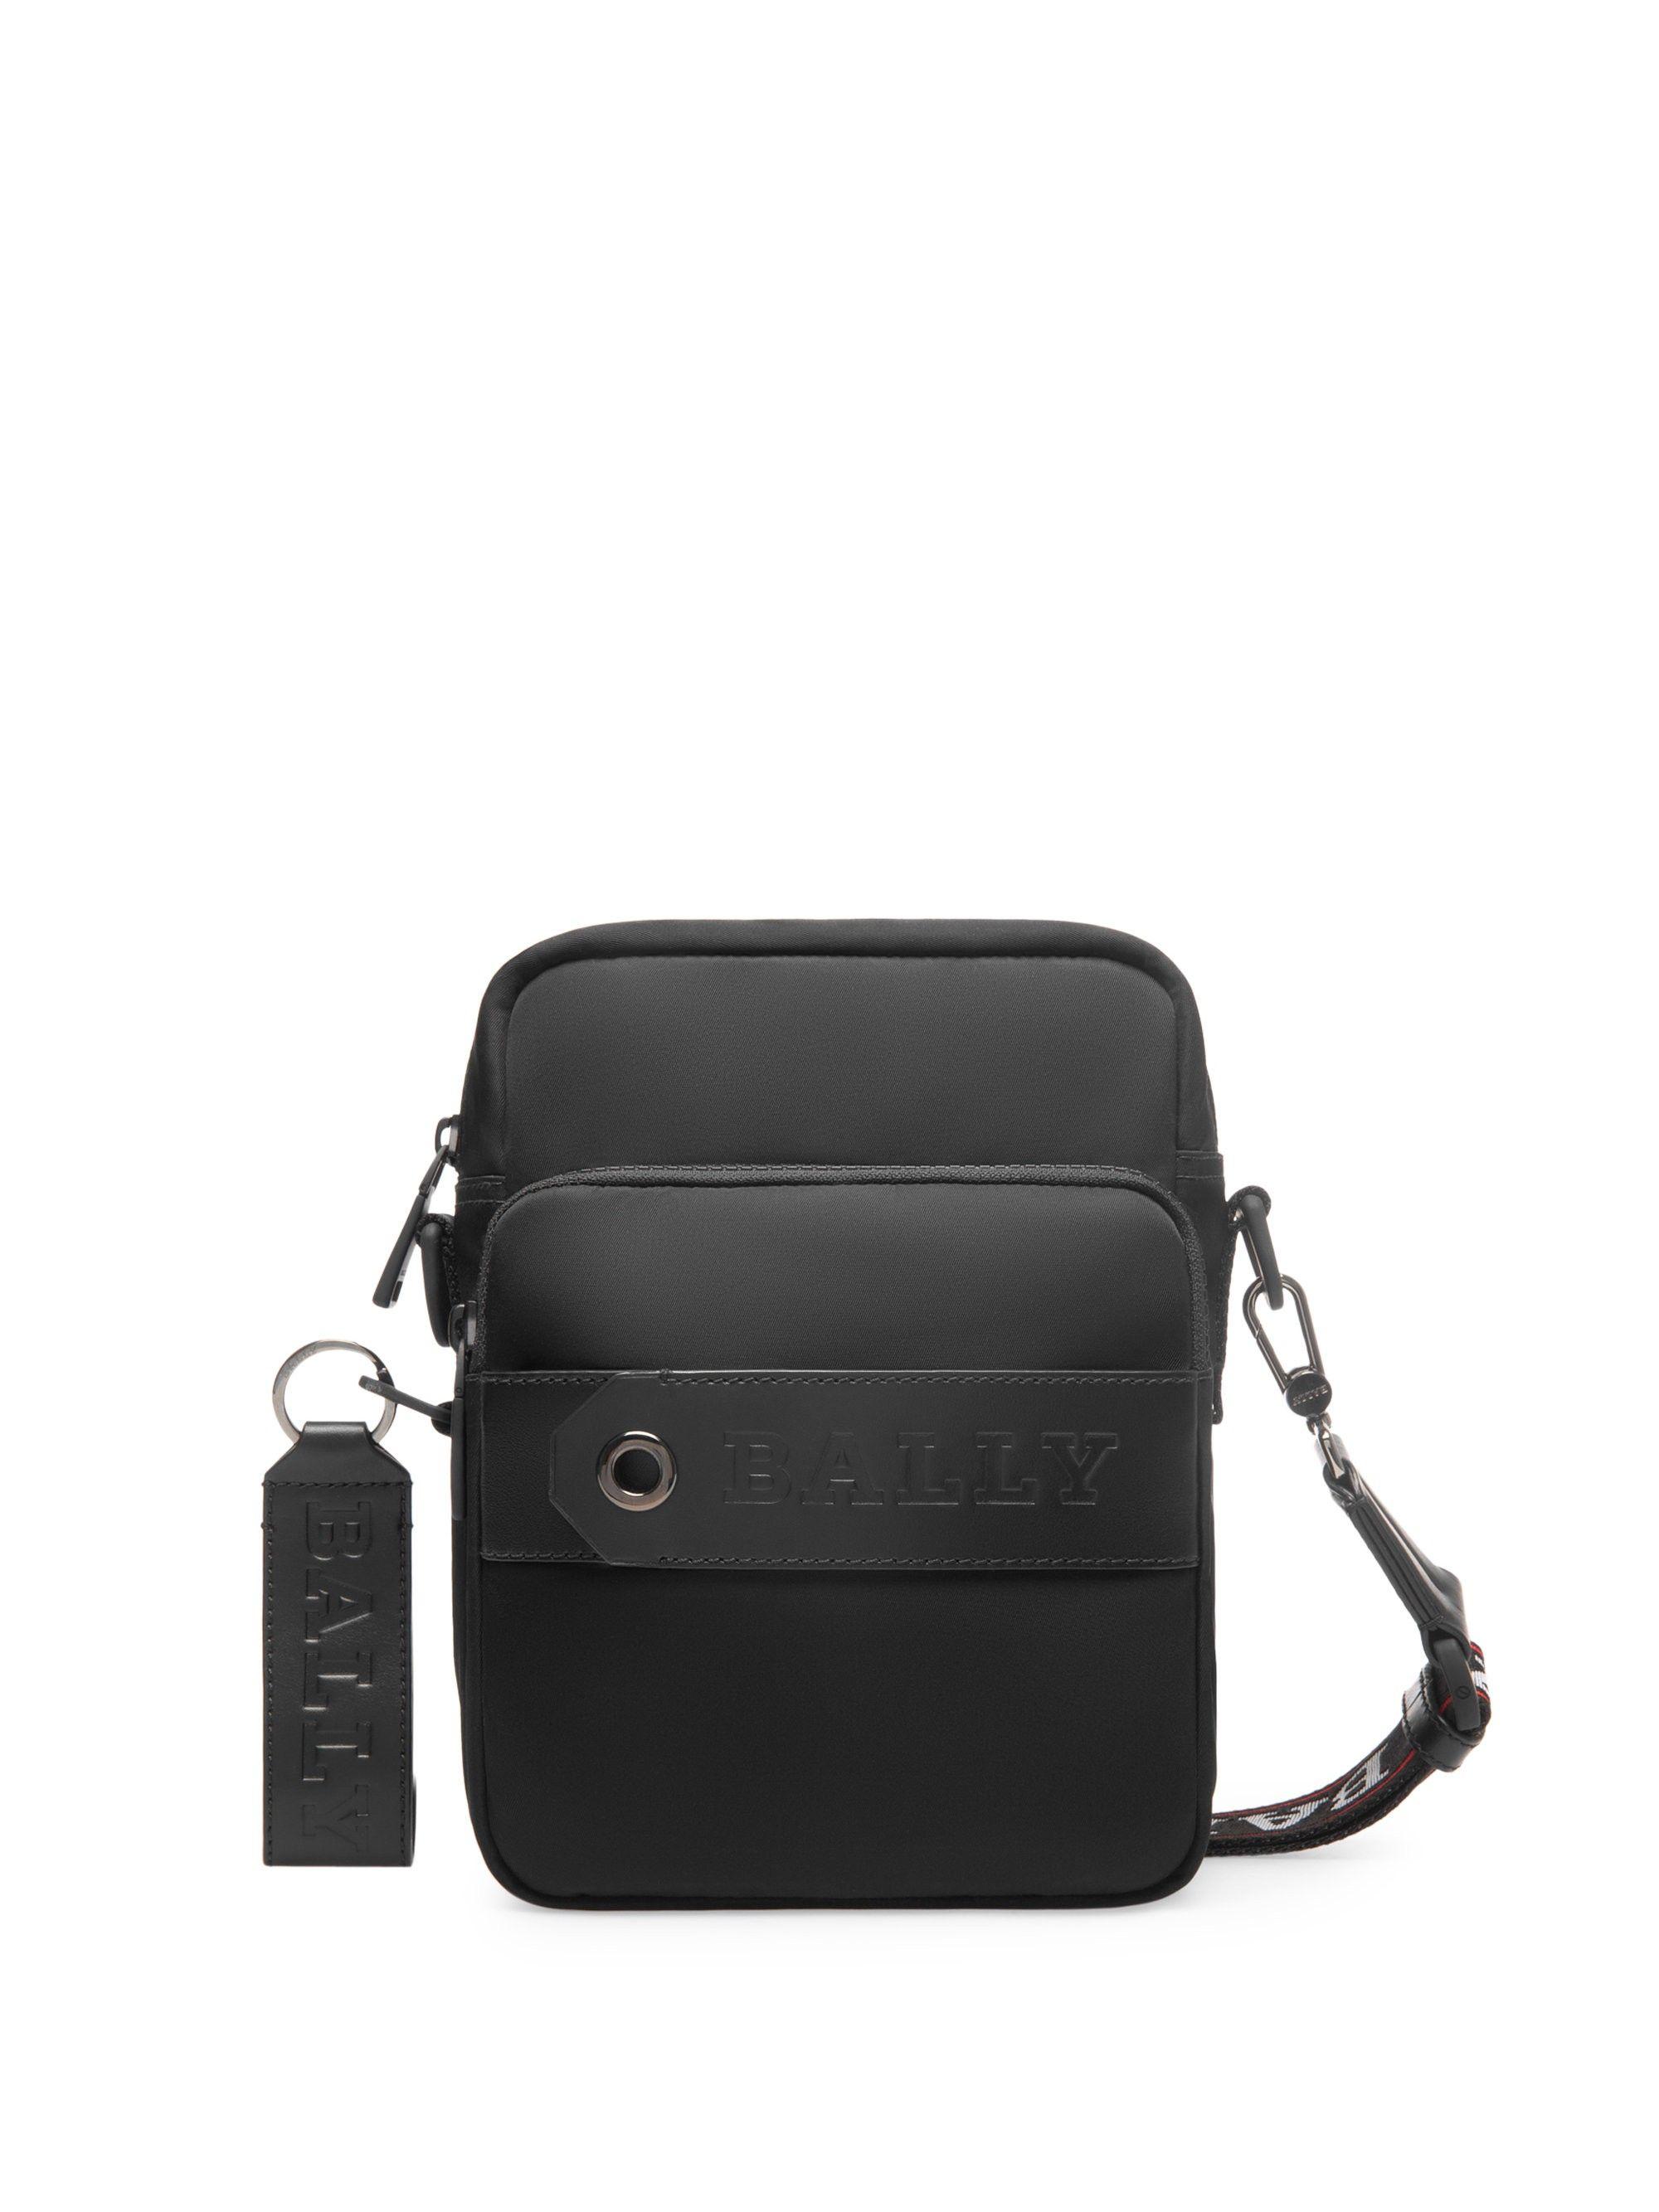 217bad1c188 BALLY Triller Crossbody Bag.  bally  bags  shoulder bags  leather  nylon   crossbody